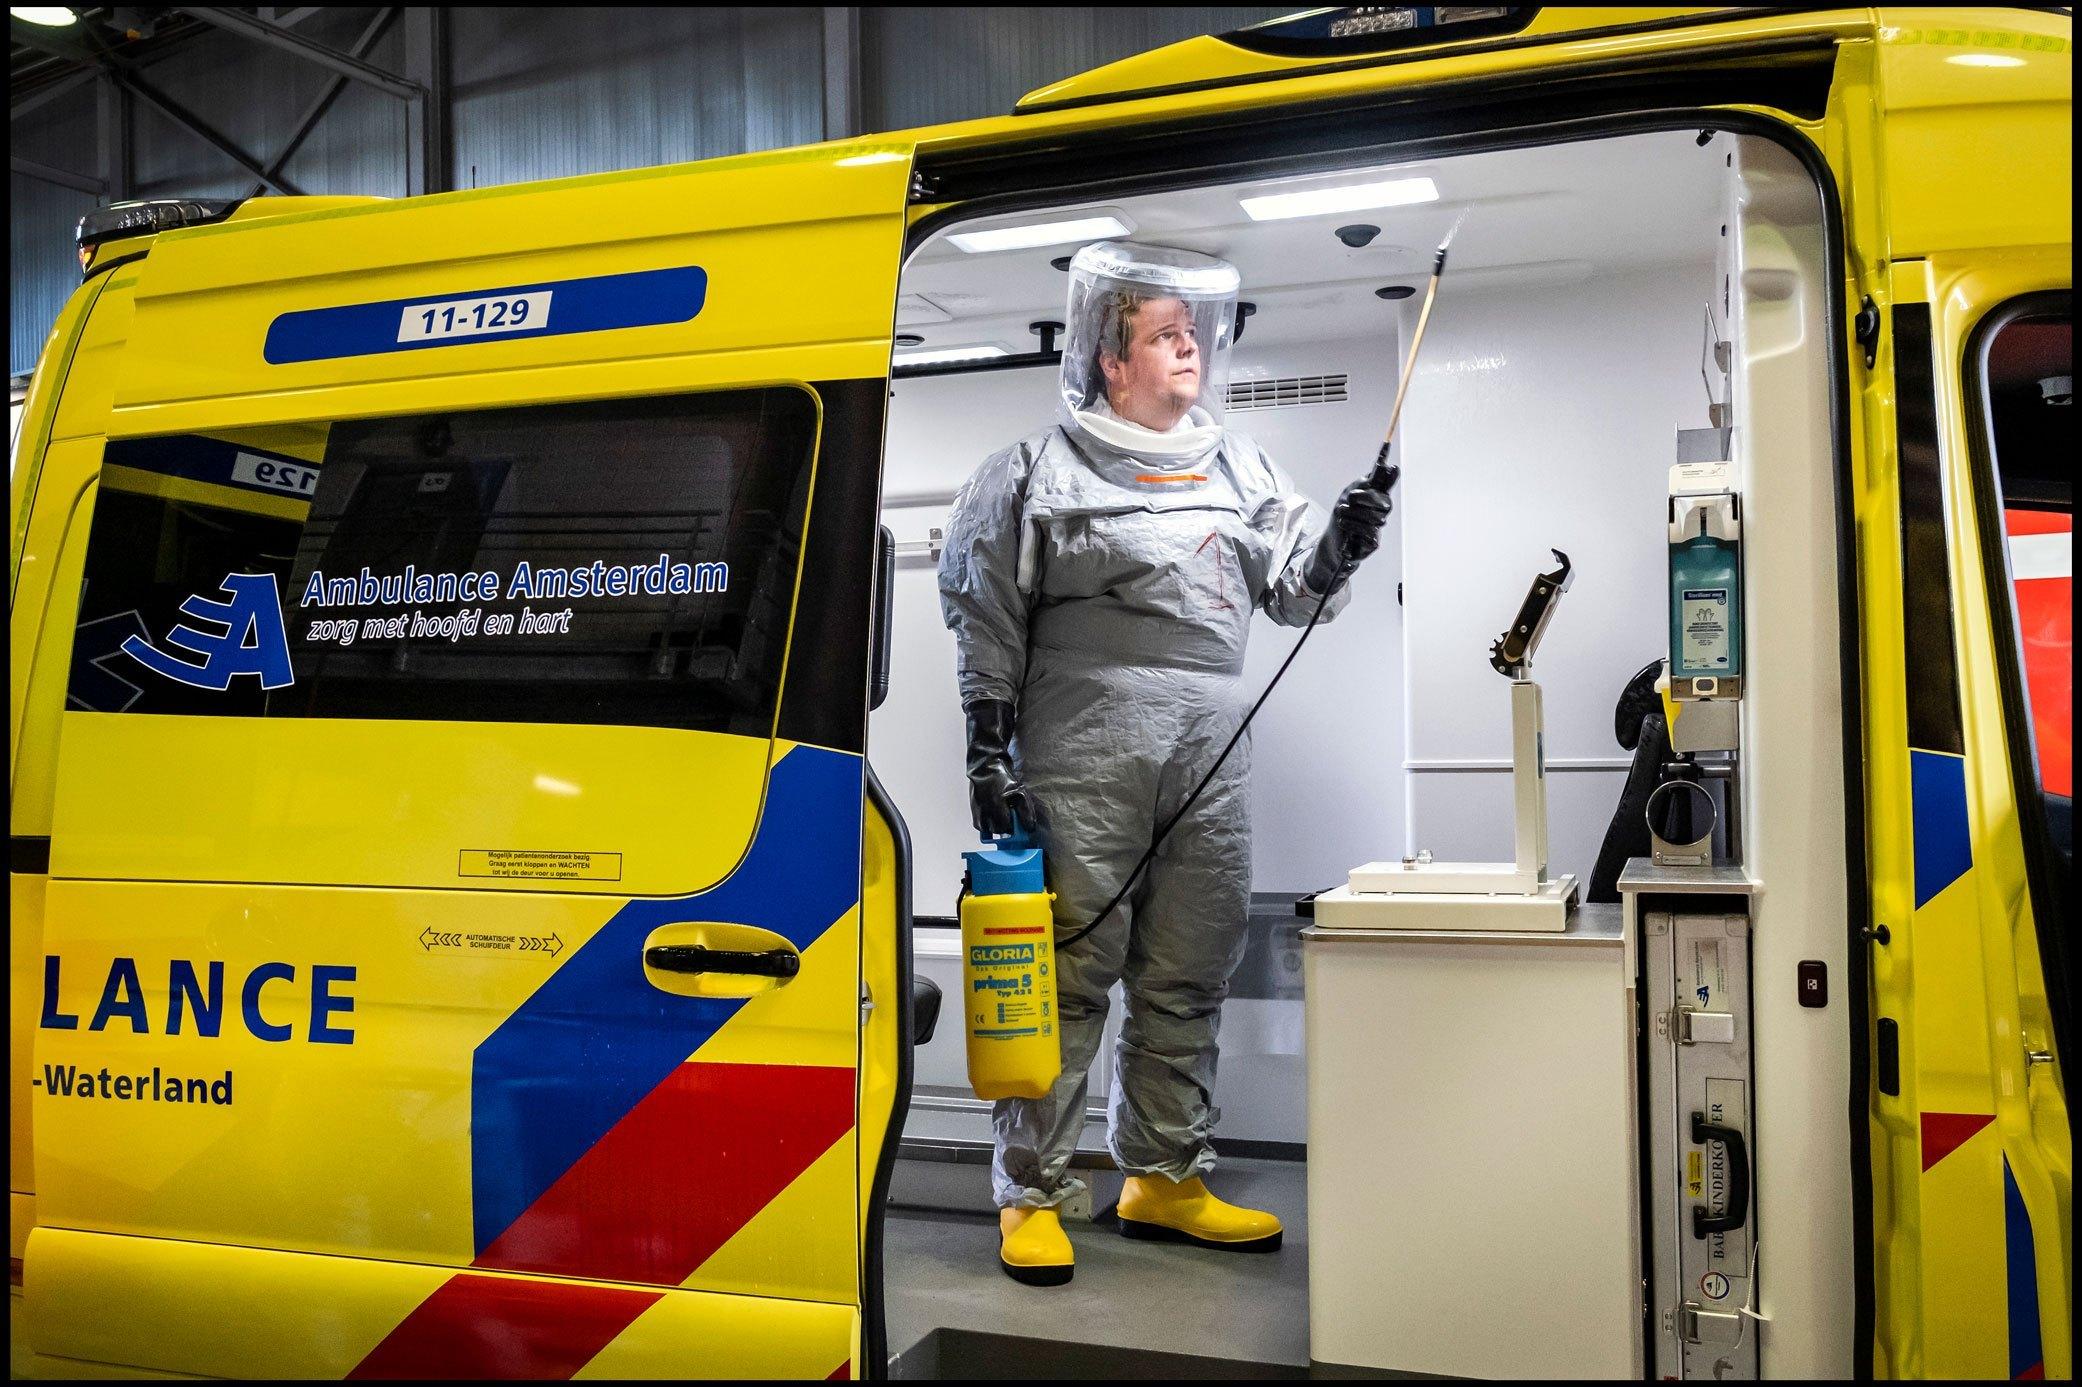 2-13960-NN-s-Ramon-van-Flymen-De-ambulance-wasstraat-in-Zaandam-003